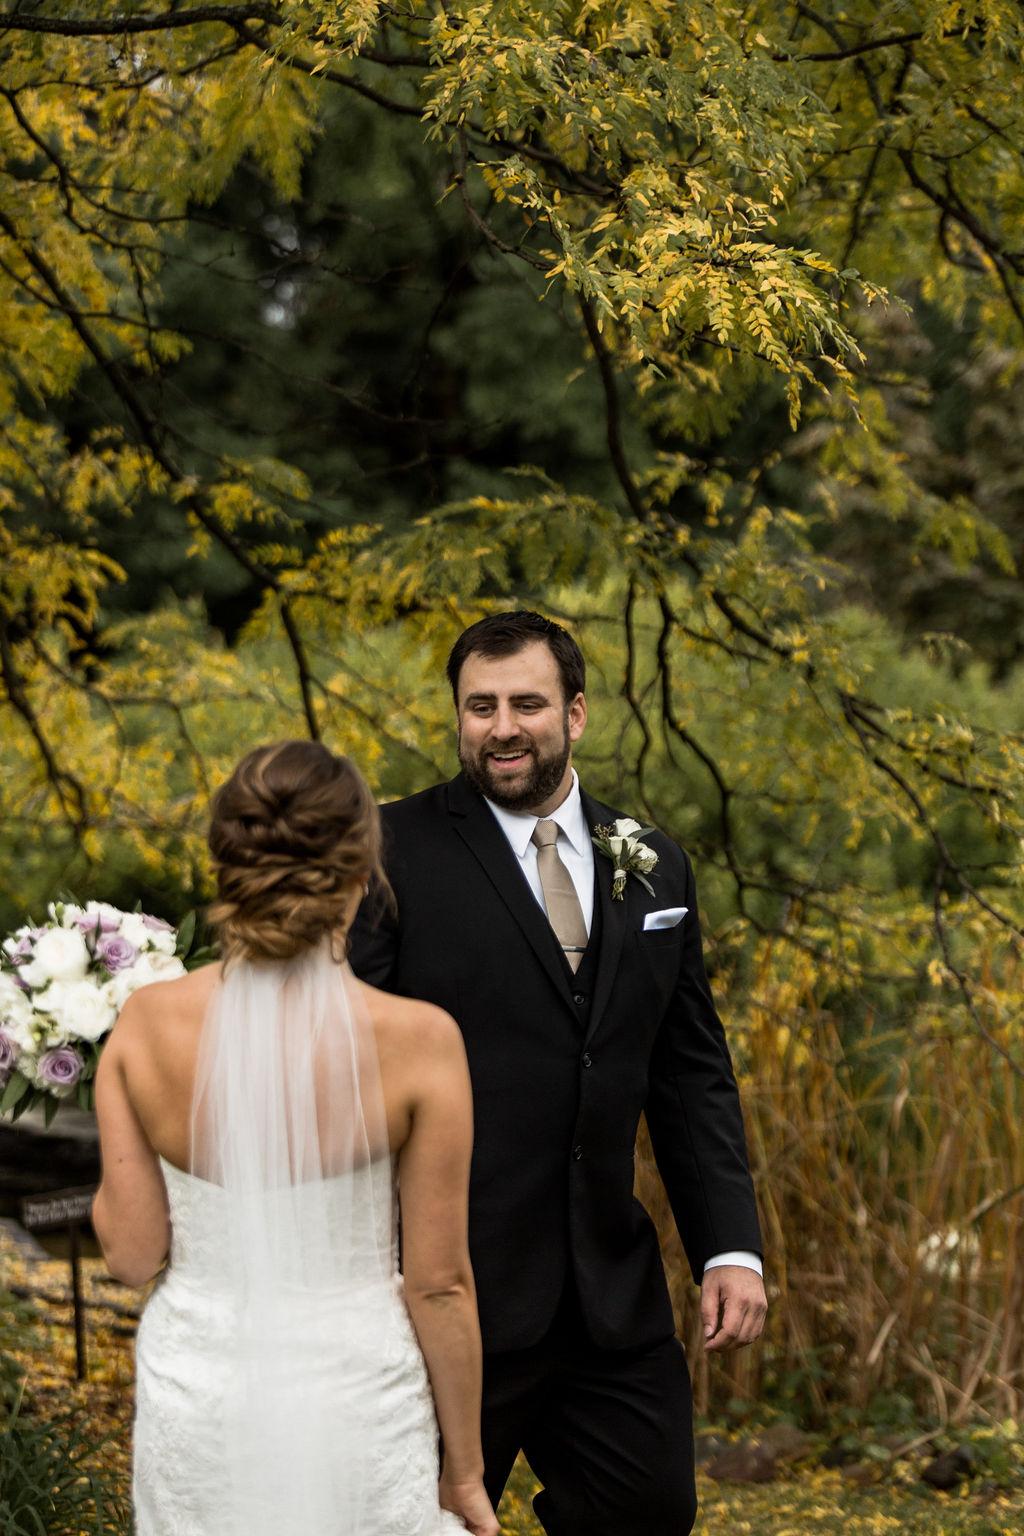 best_midwest_wedding_photographer_JMH_photography-33.jpg